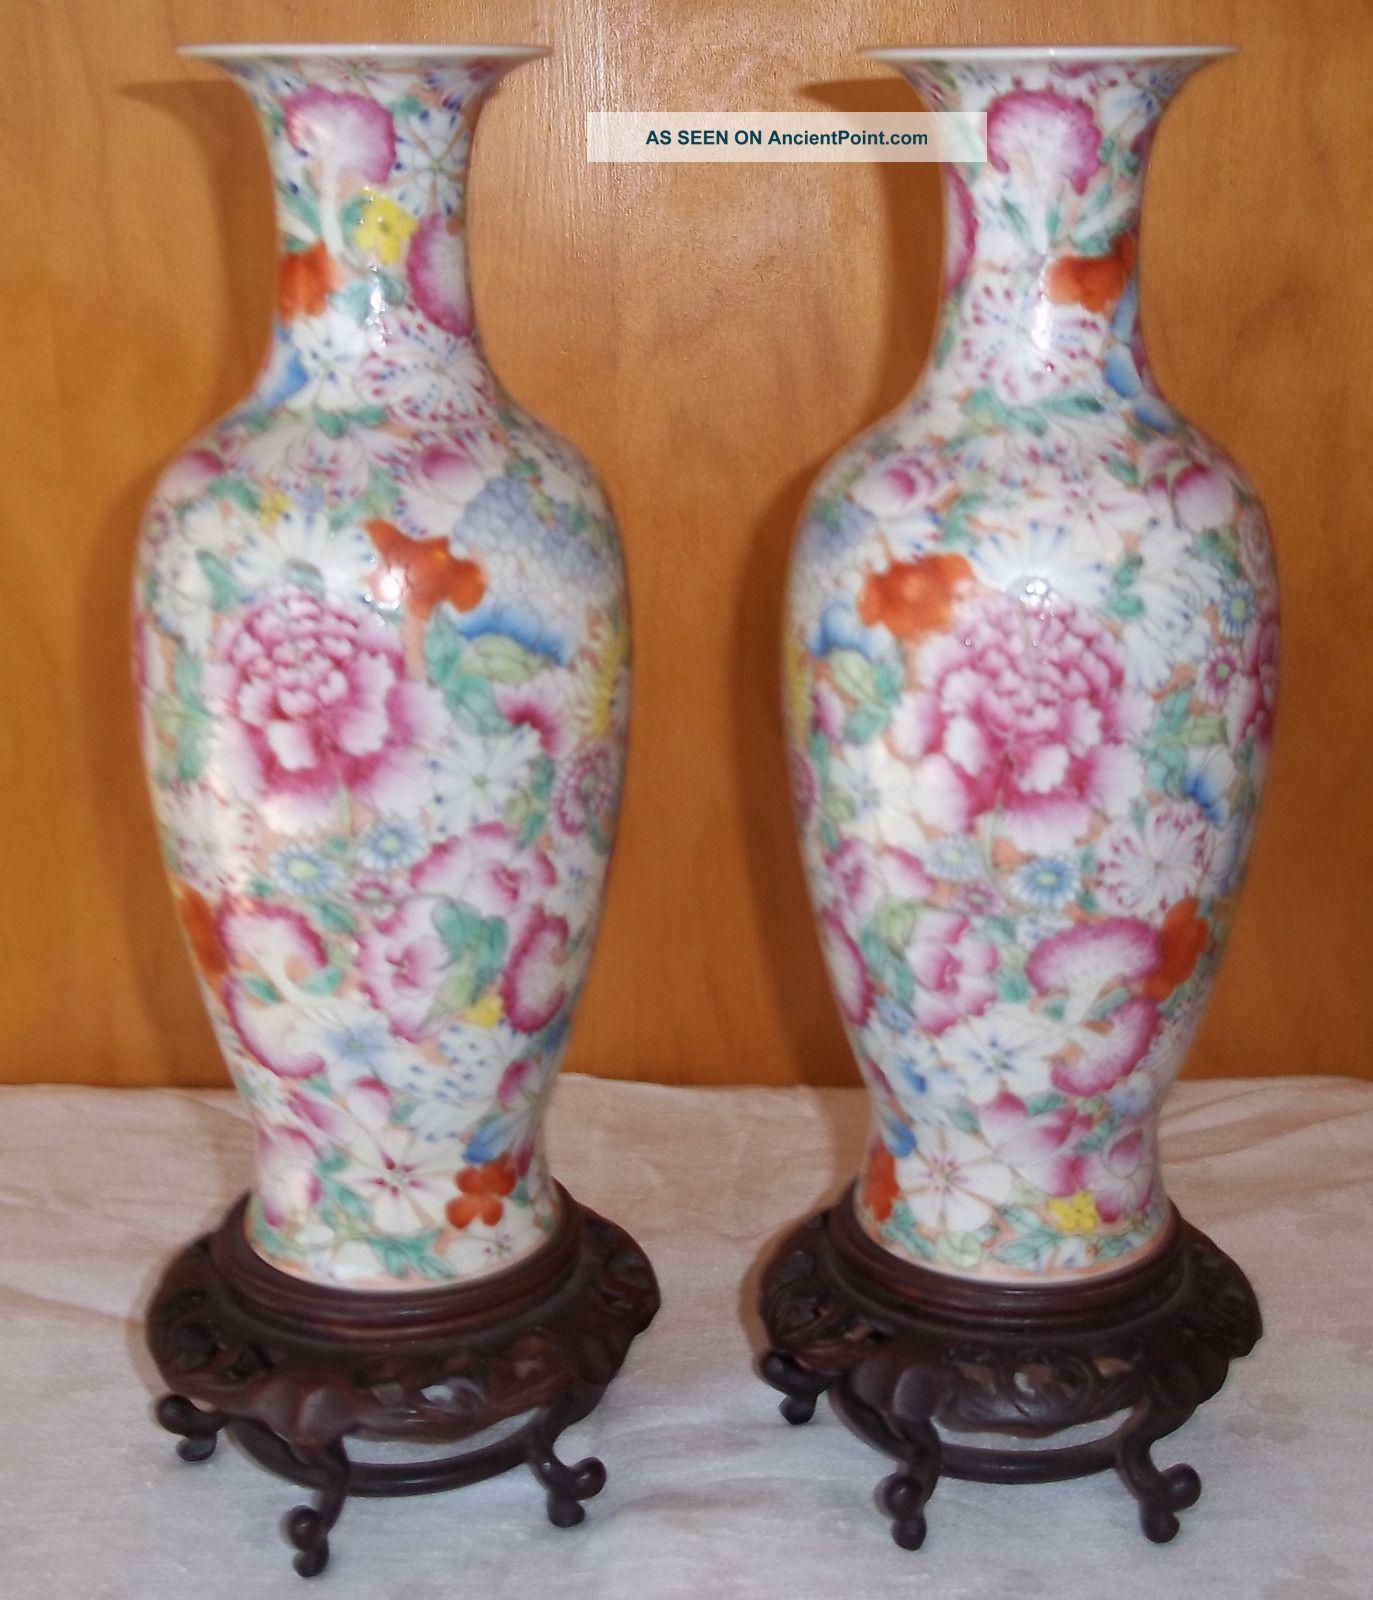 vase wallpaper 7391 1920 - photo #44